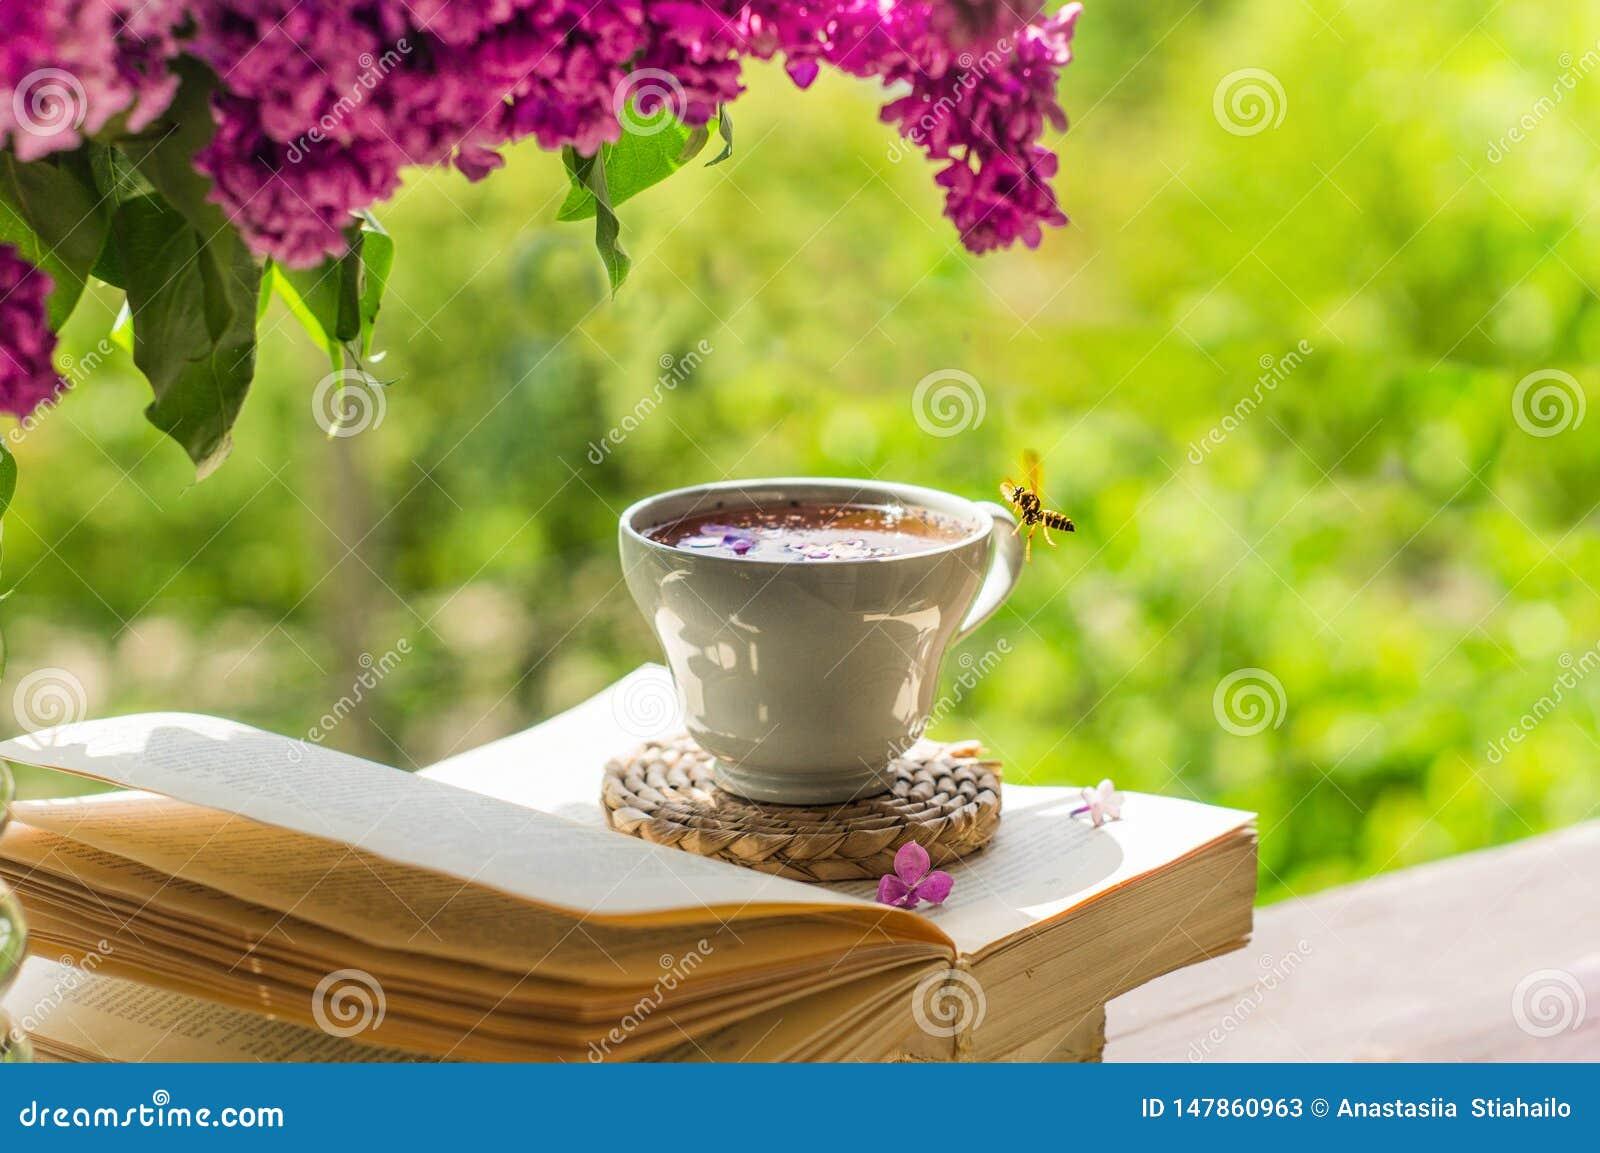 Ksi??ka, szk?a, fili?anka herbata i bez na drewnianym okno, Pszczo?a lata pi?knie nad lilymi p?atkami